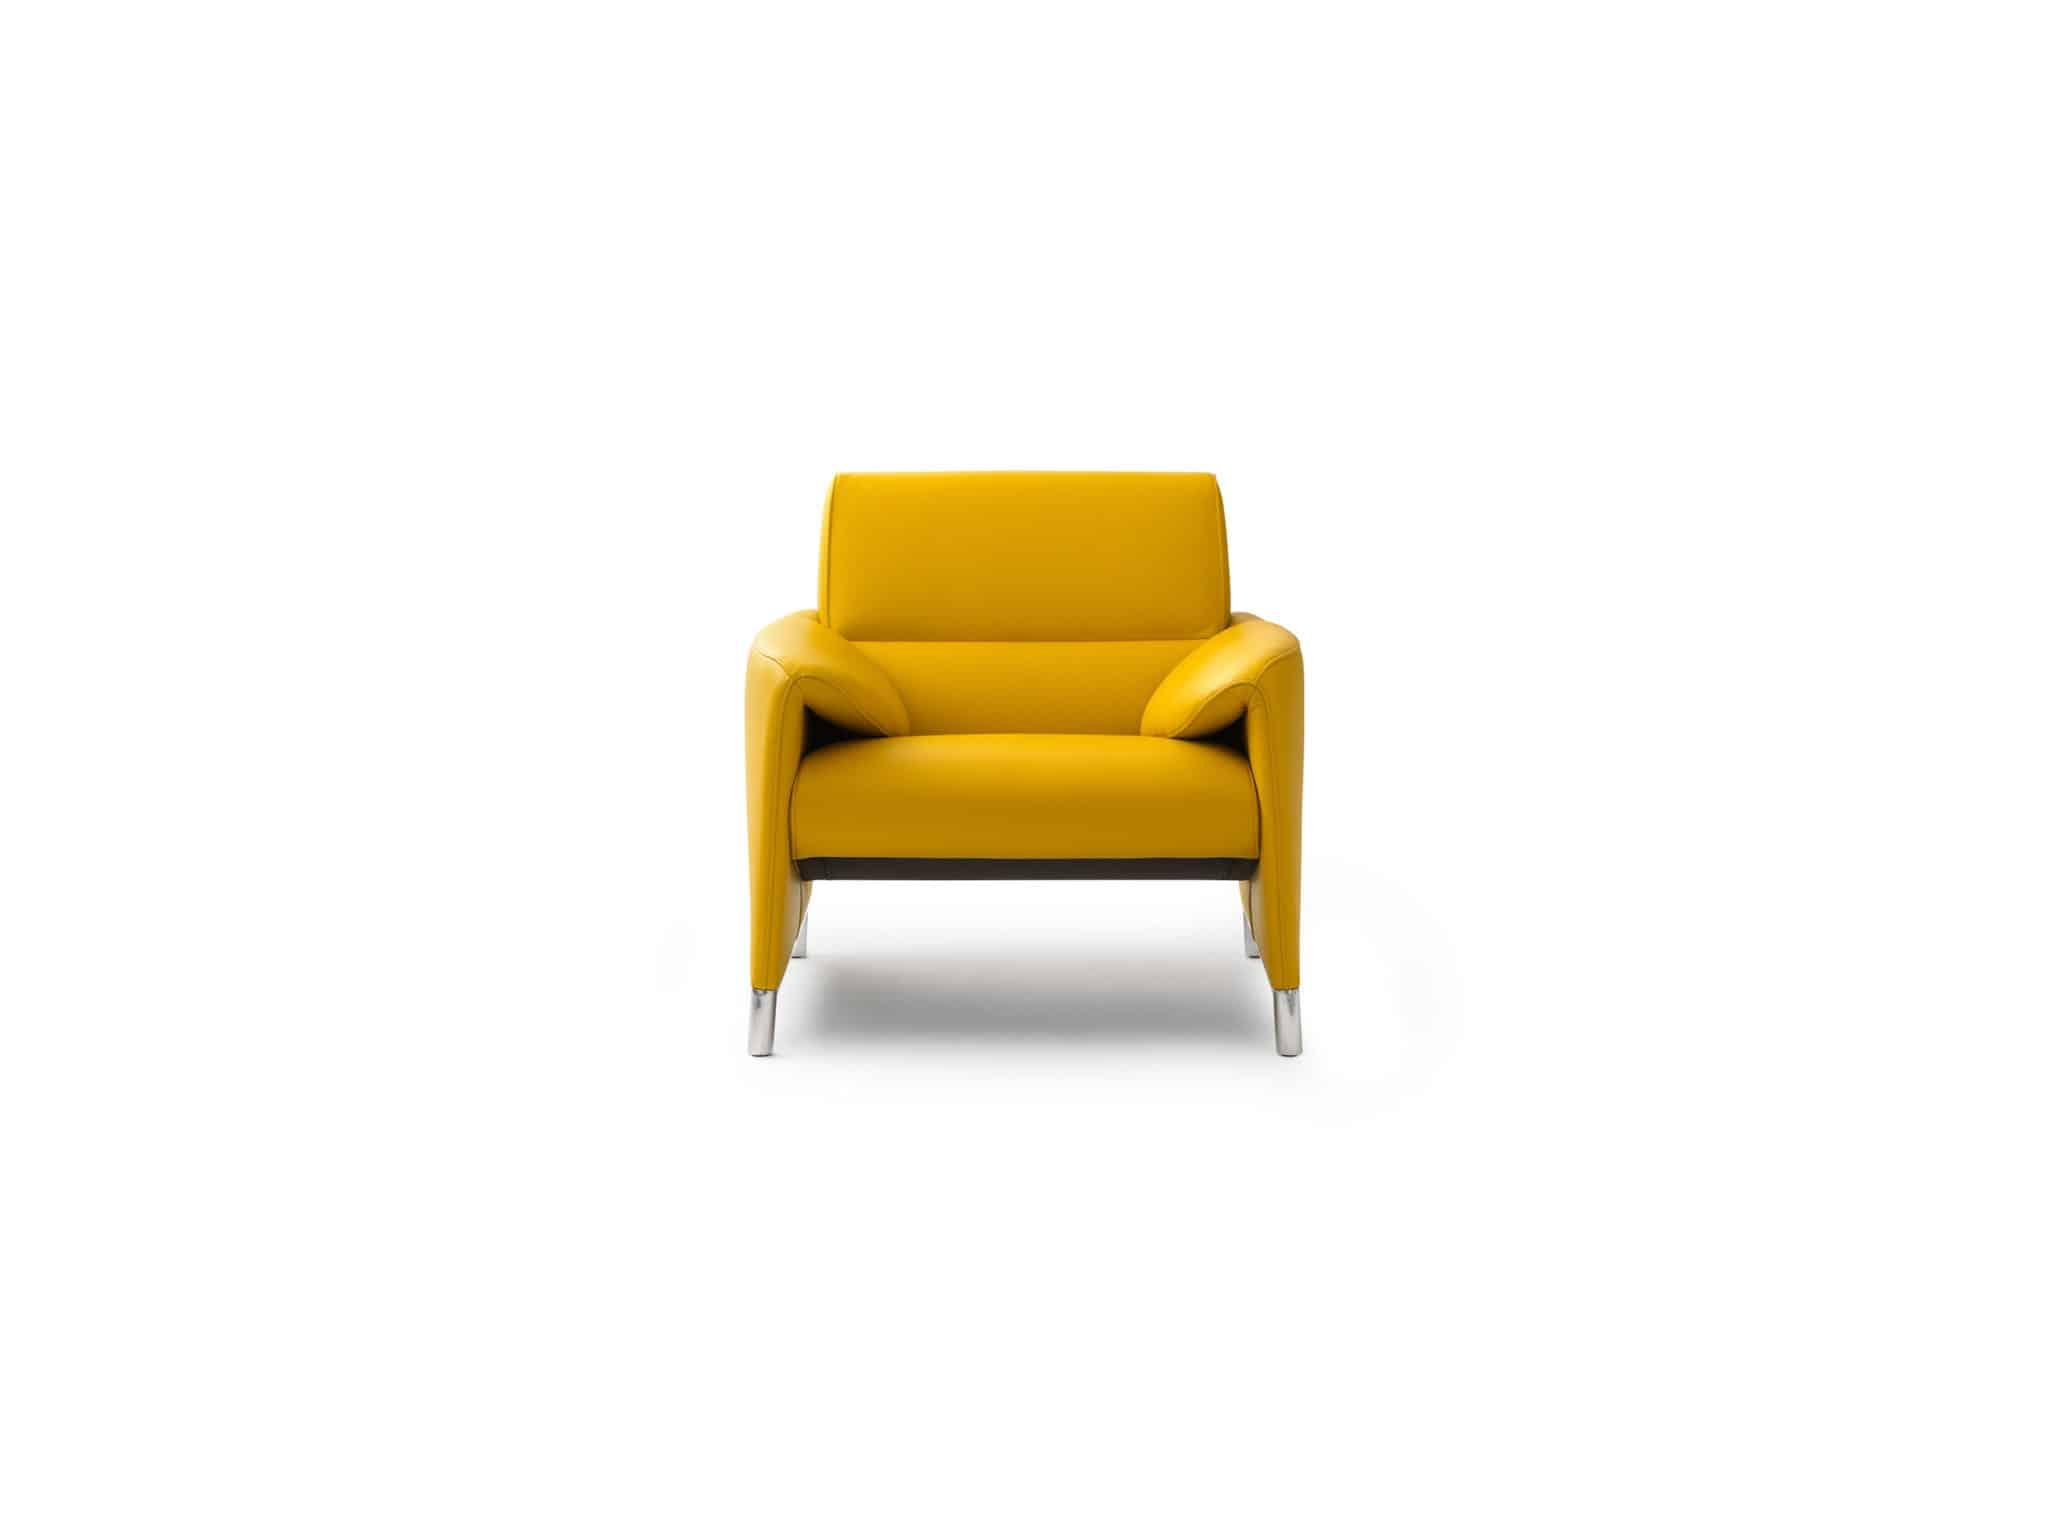 Leolux fauteuil Felizia pa